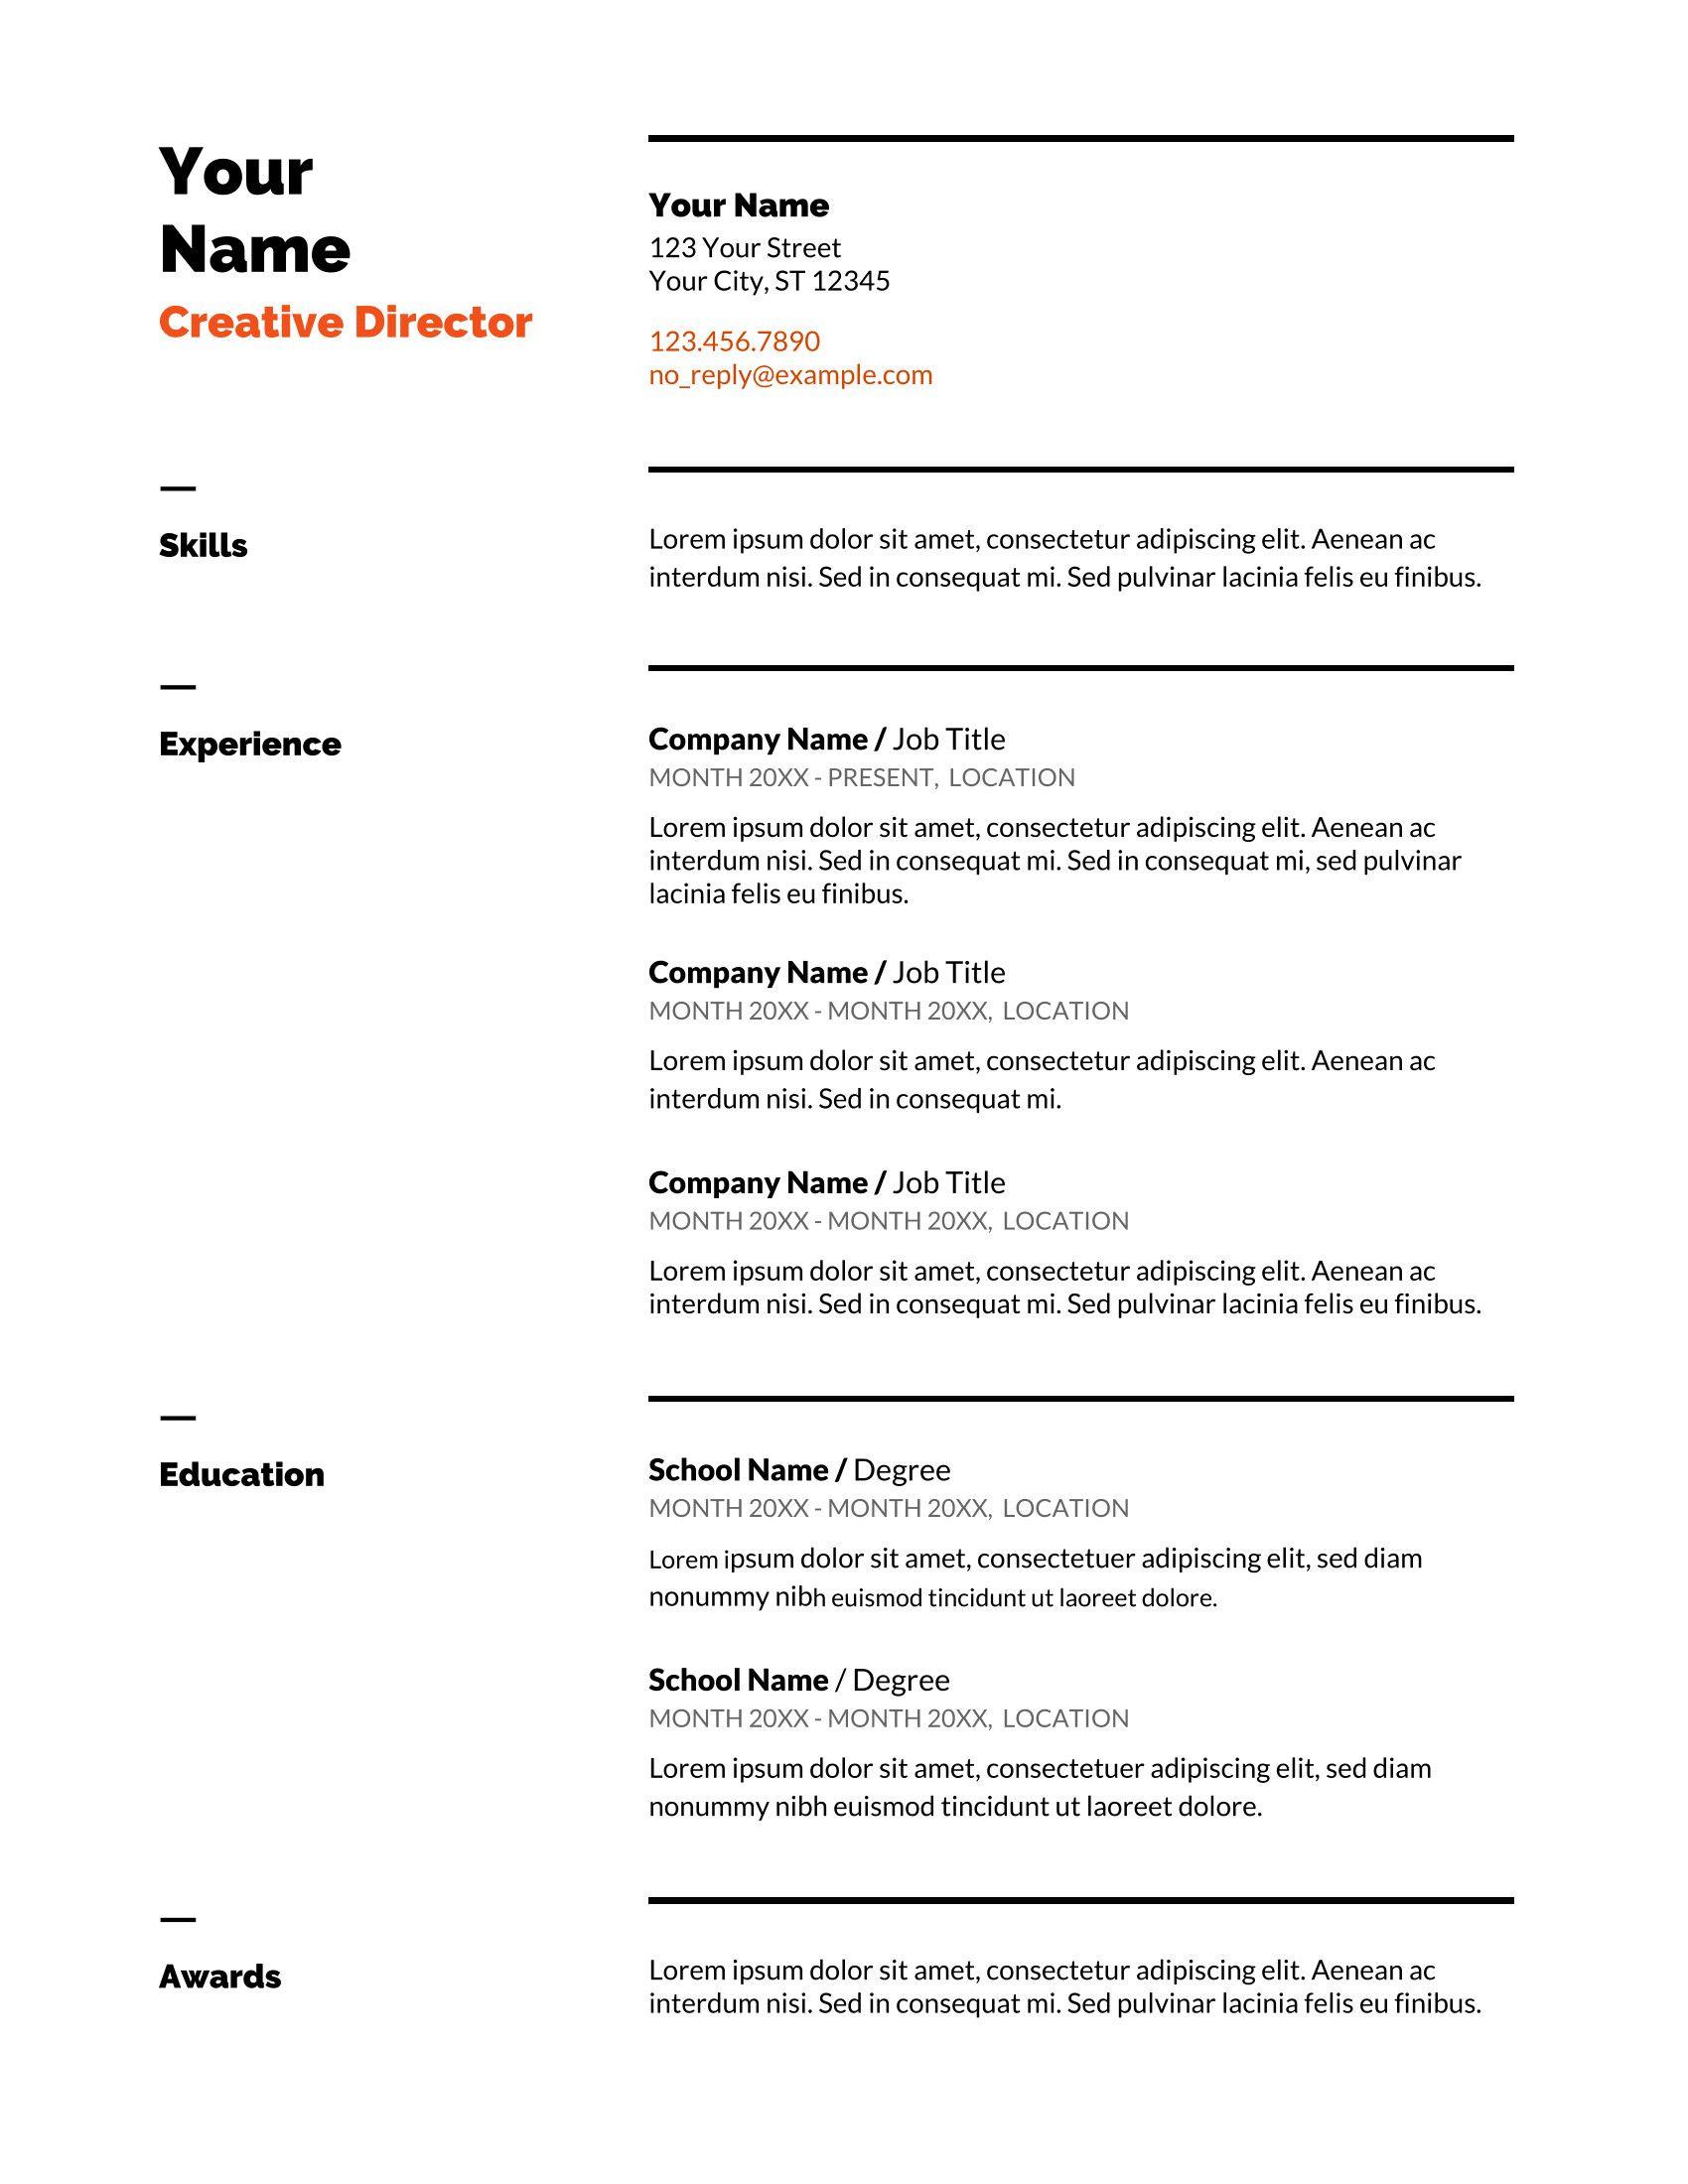 google docs resume templates Downloadable resume